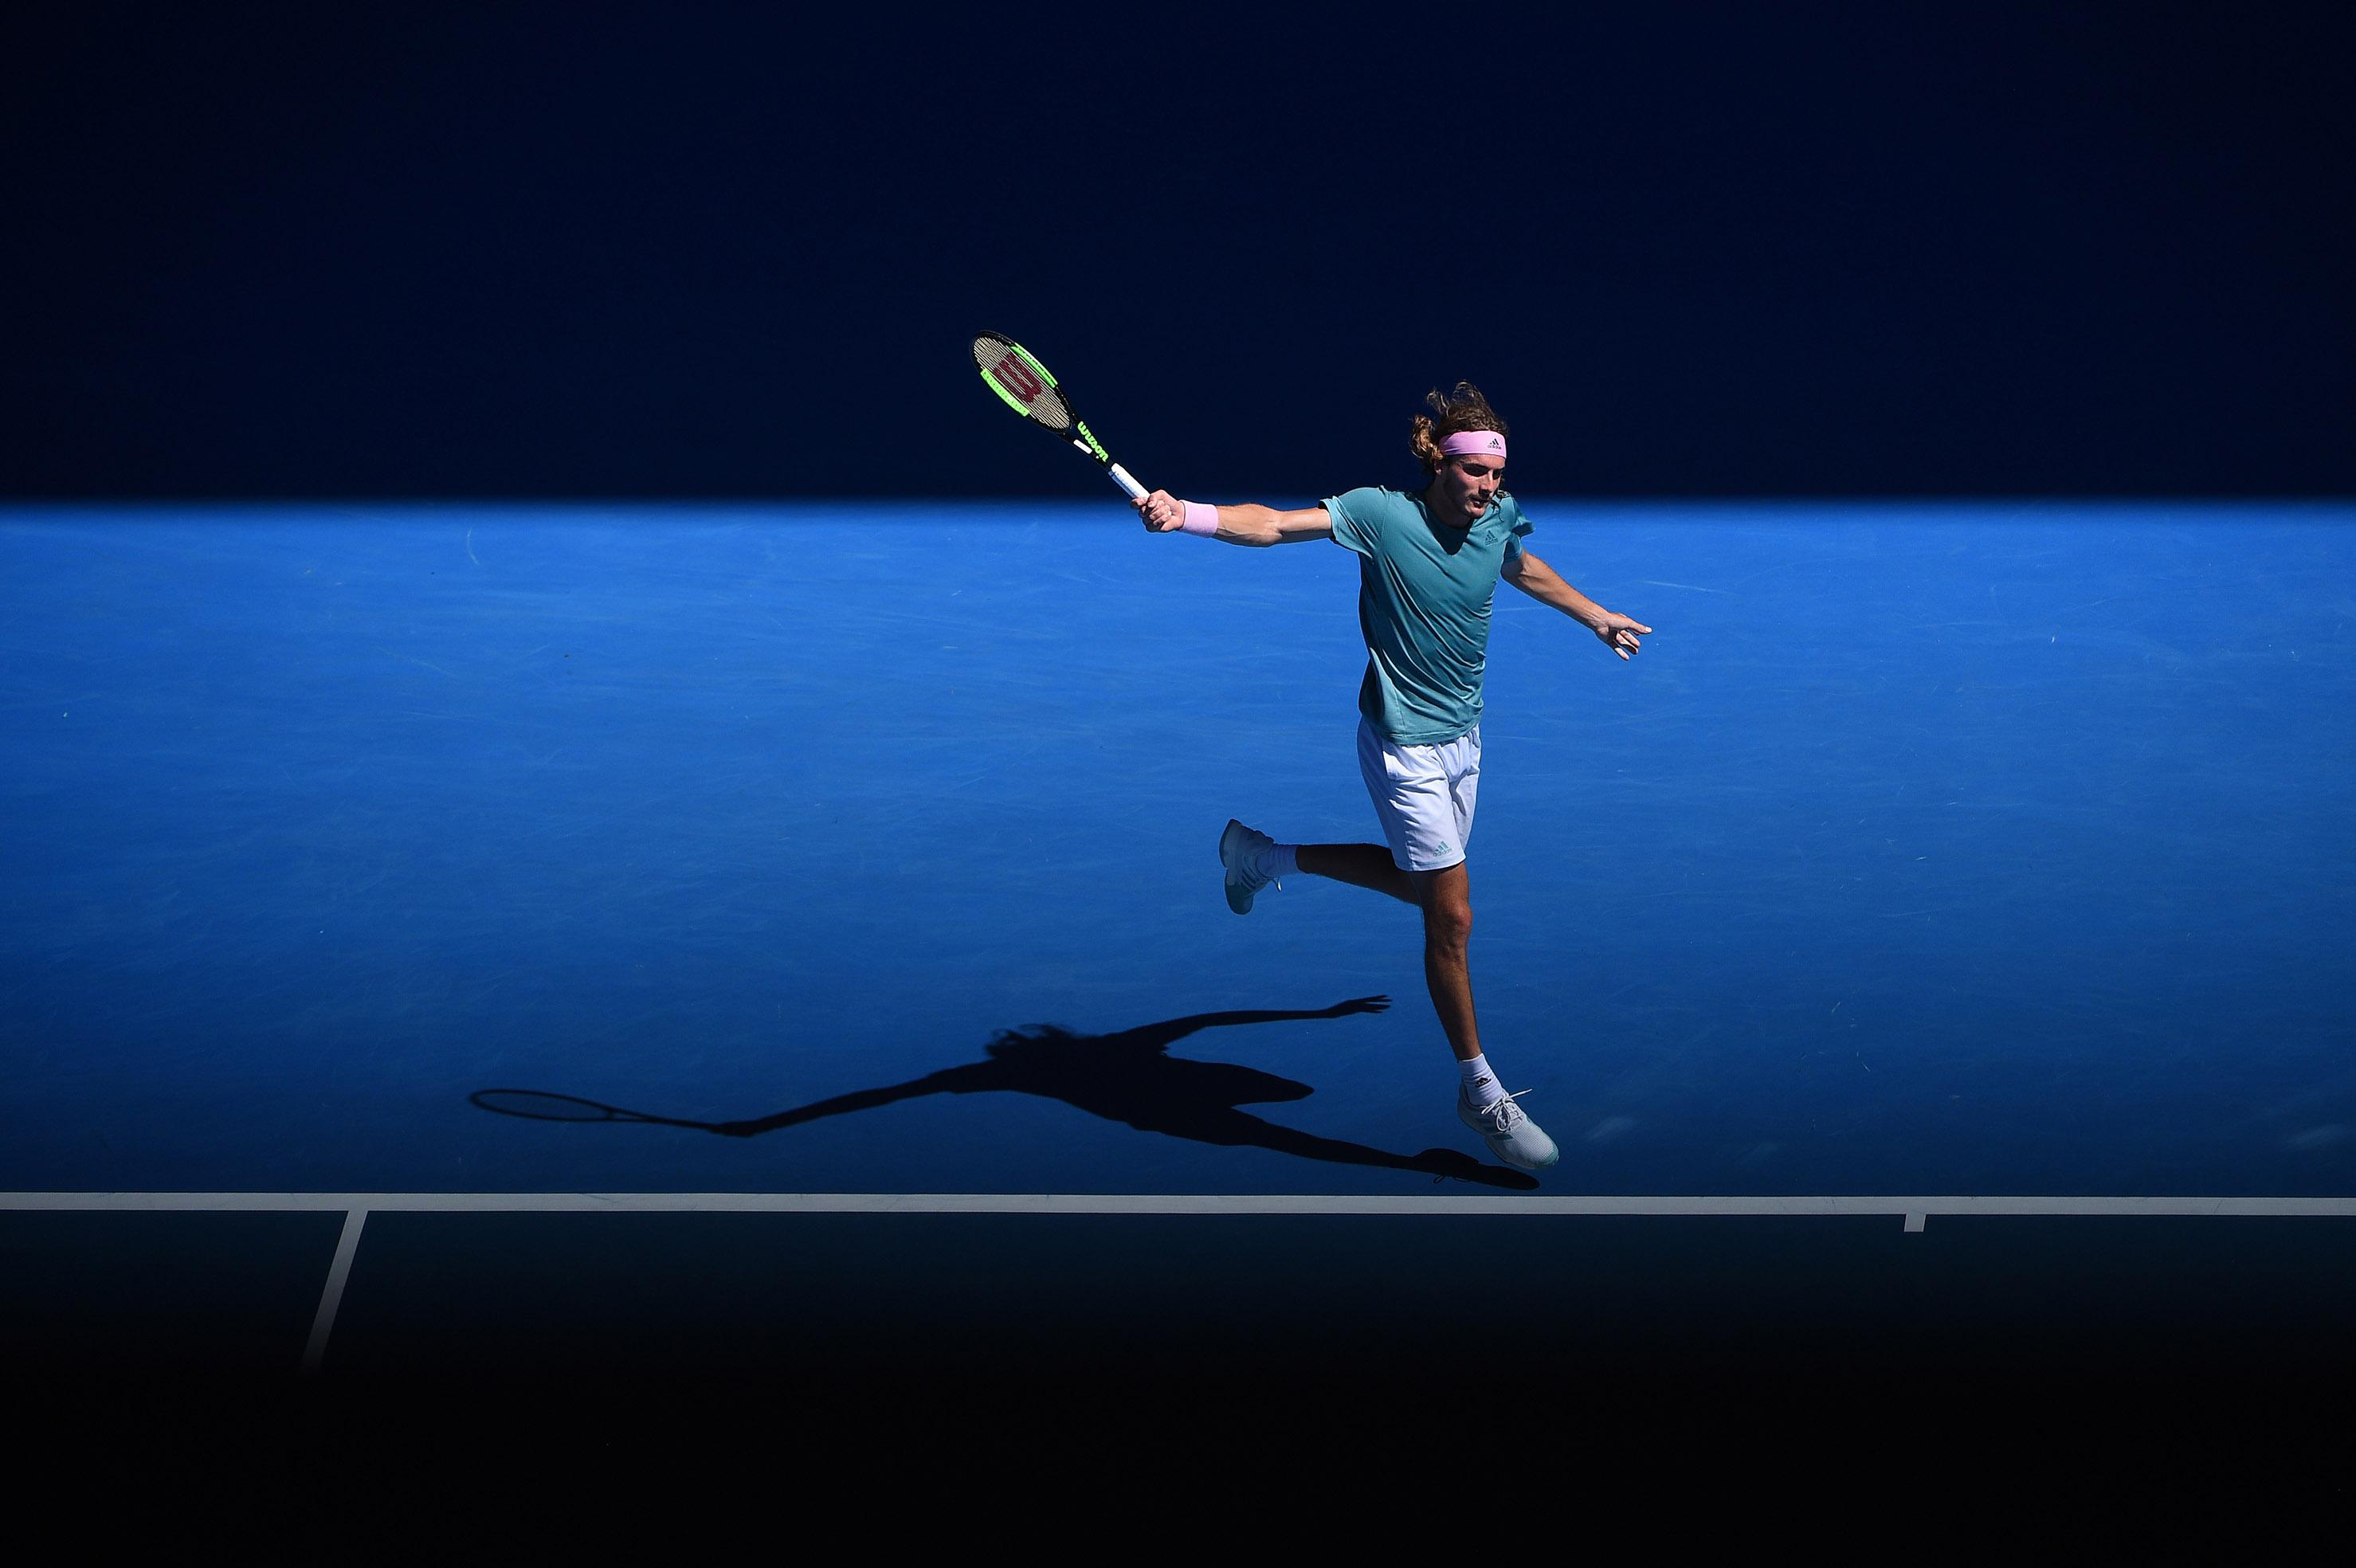 Stefanos Tsitsipas hitting a backhand in the beautiful light of the 2019 Australian Open